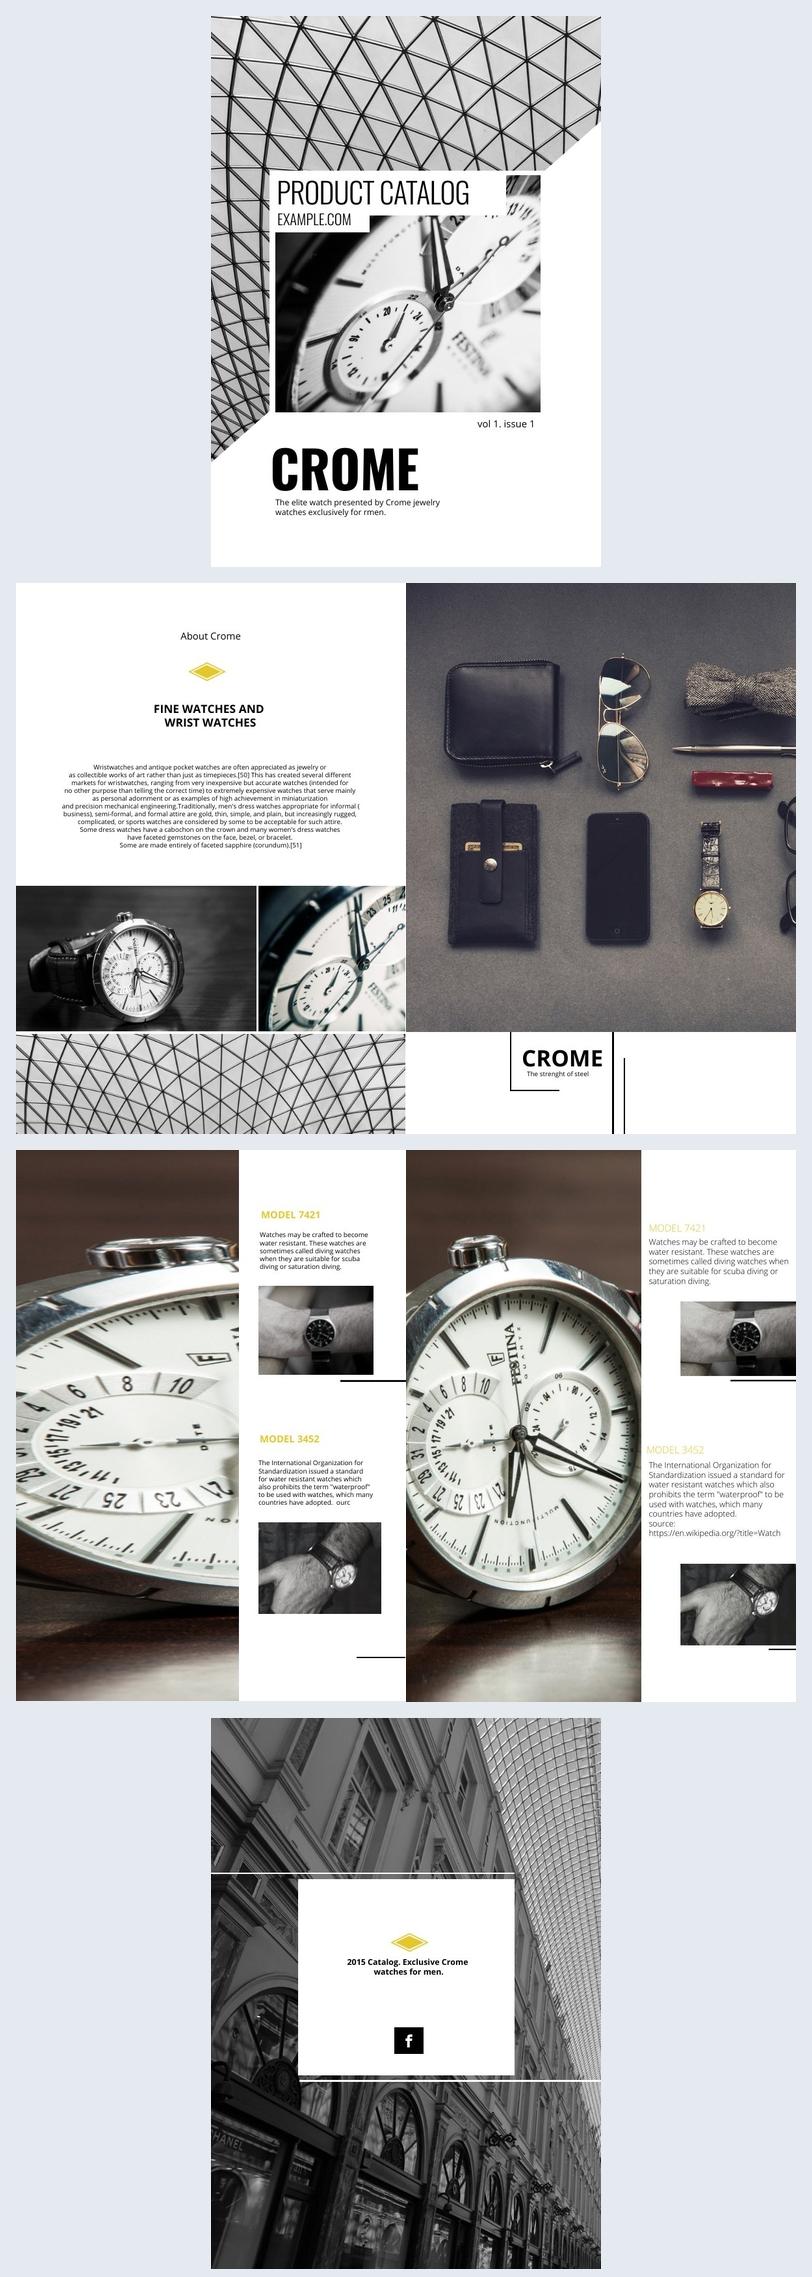 Diseño para catálogo de productos